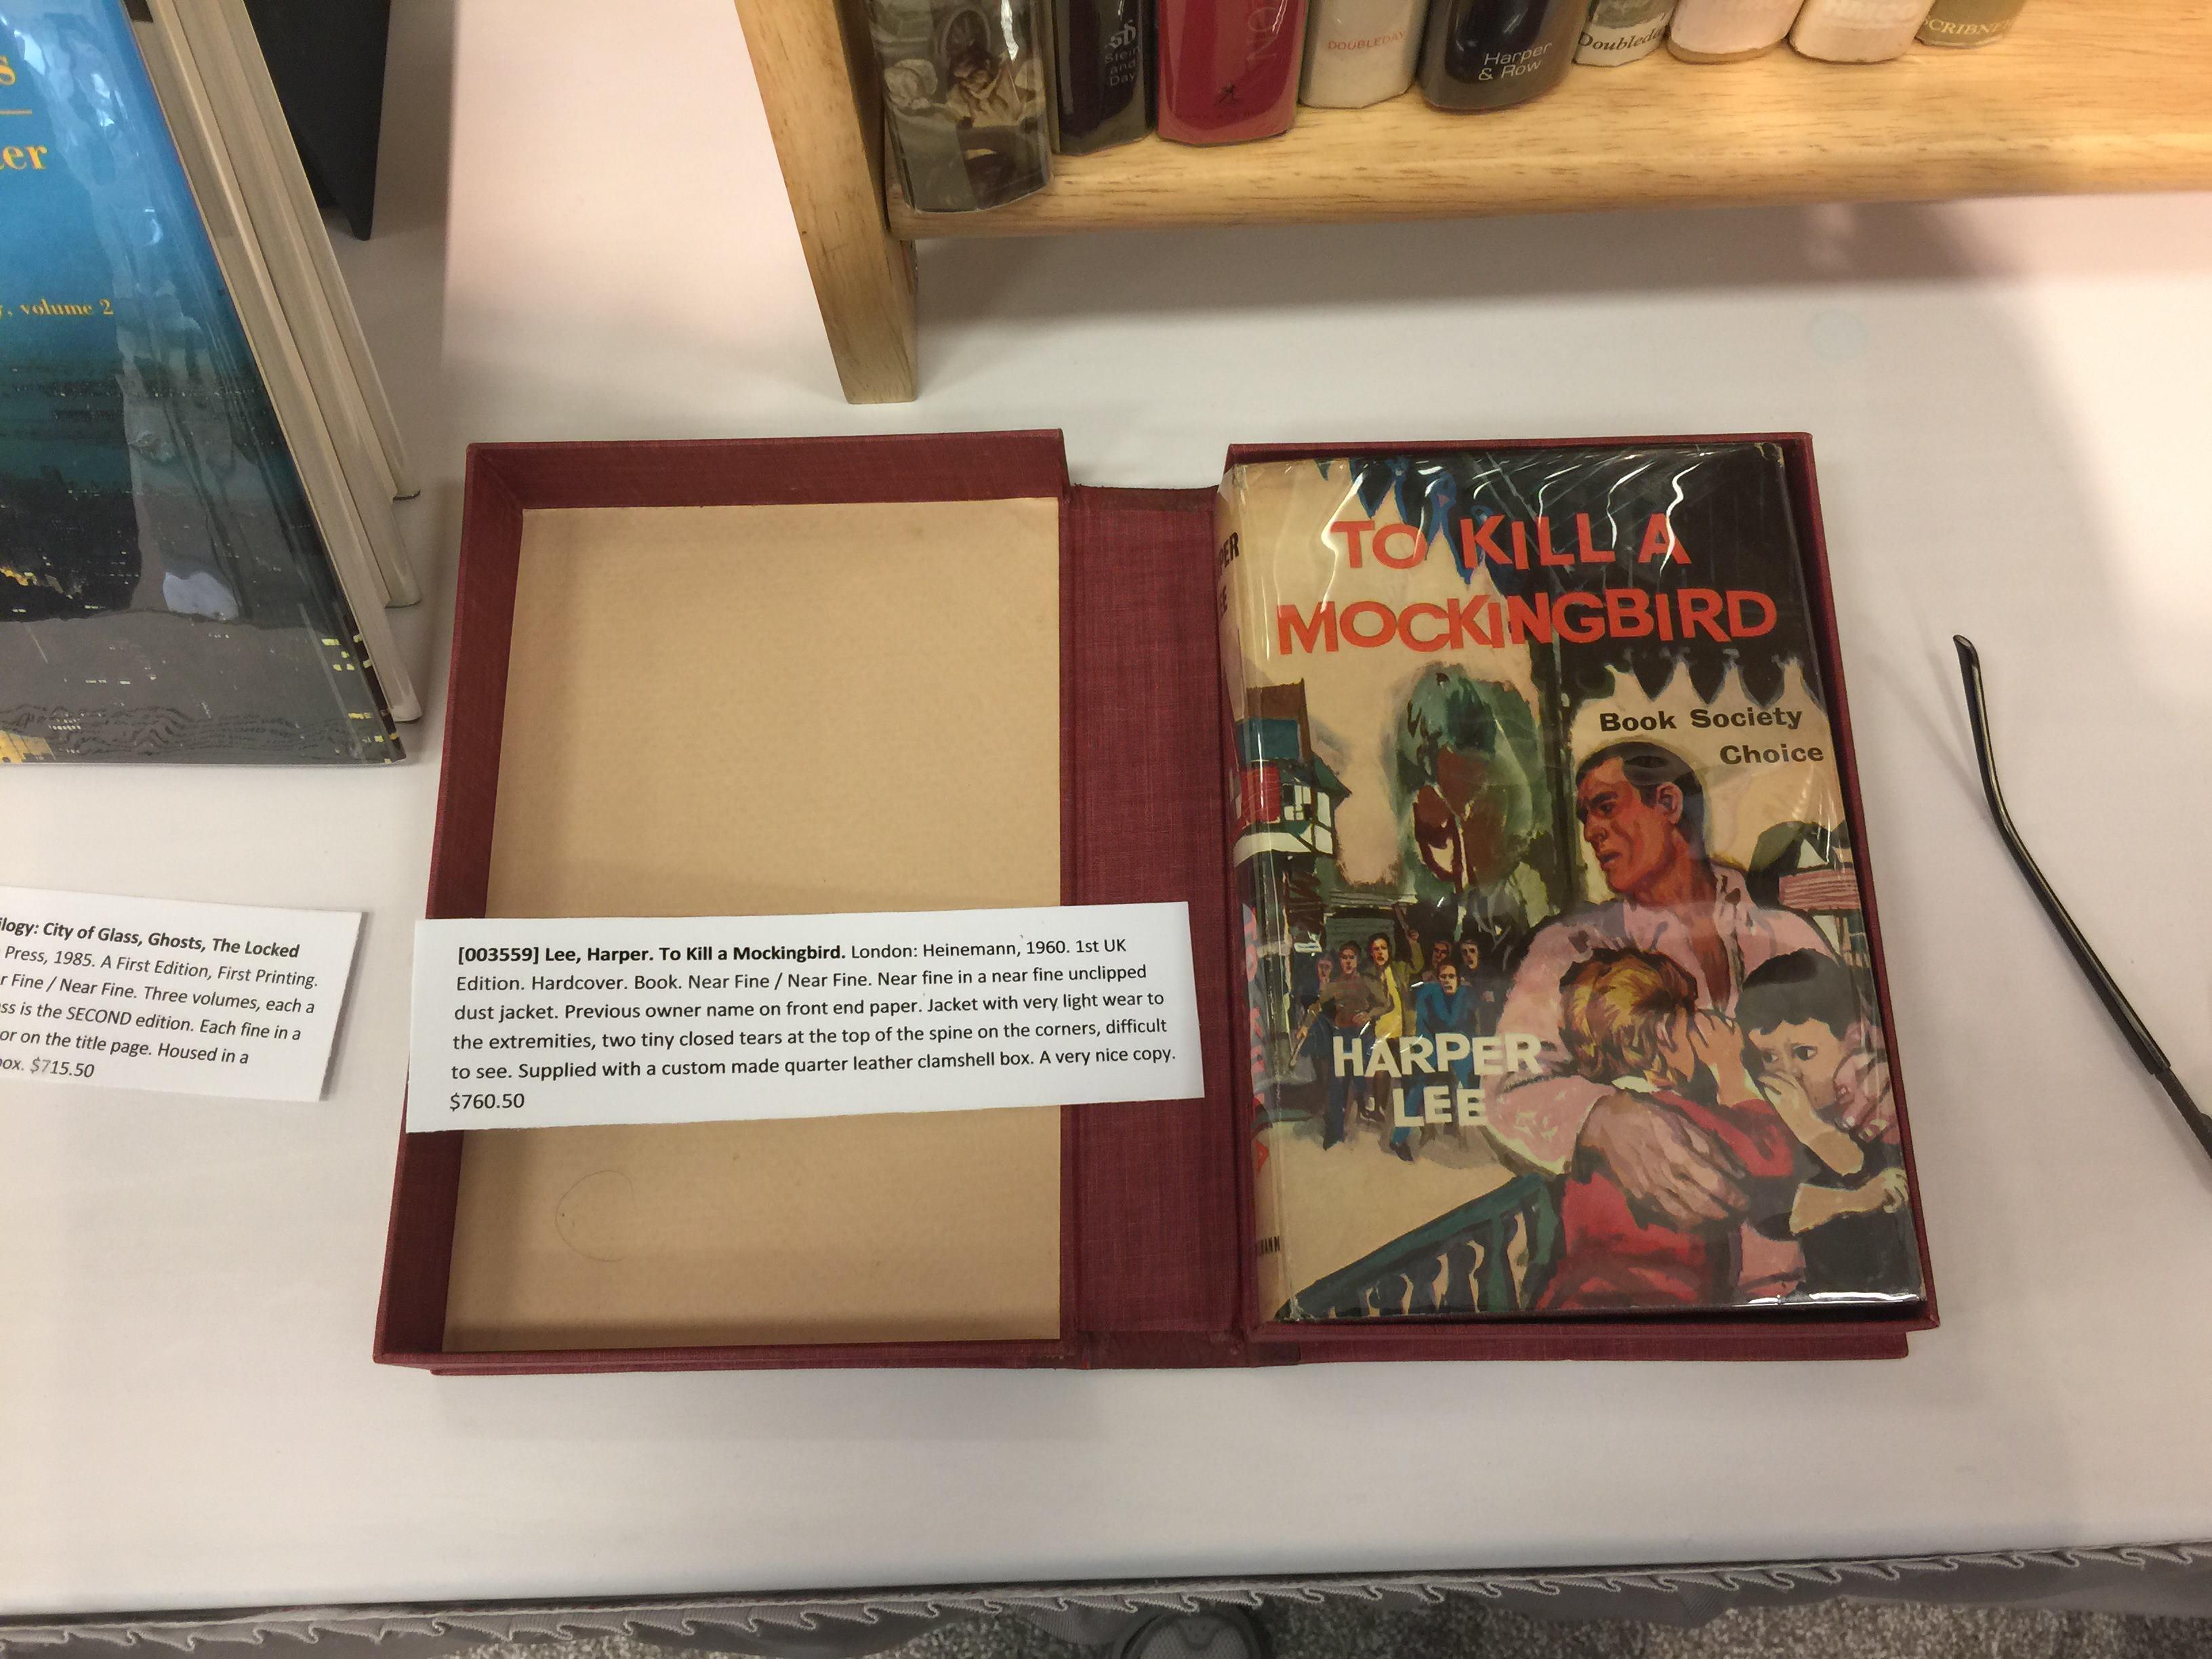 Harper Lee's To Kill a Mockingbird British first edition